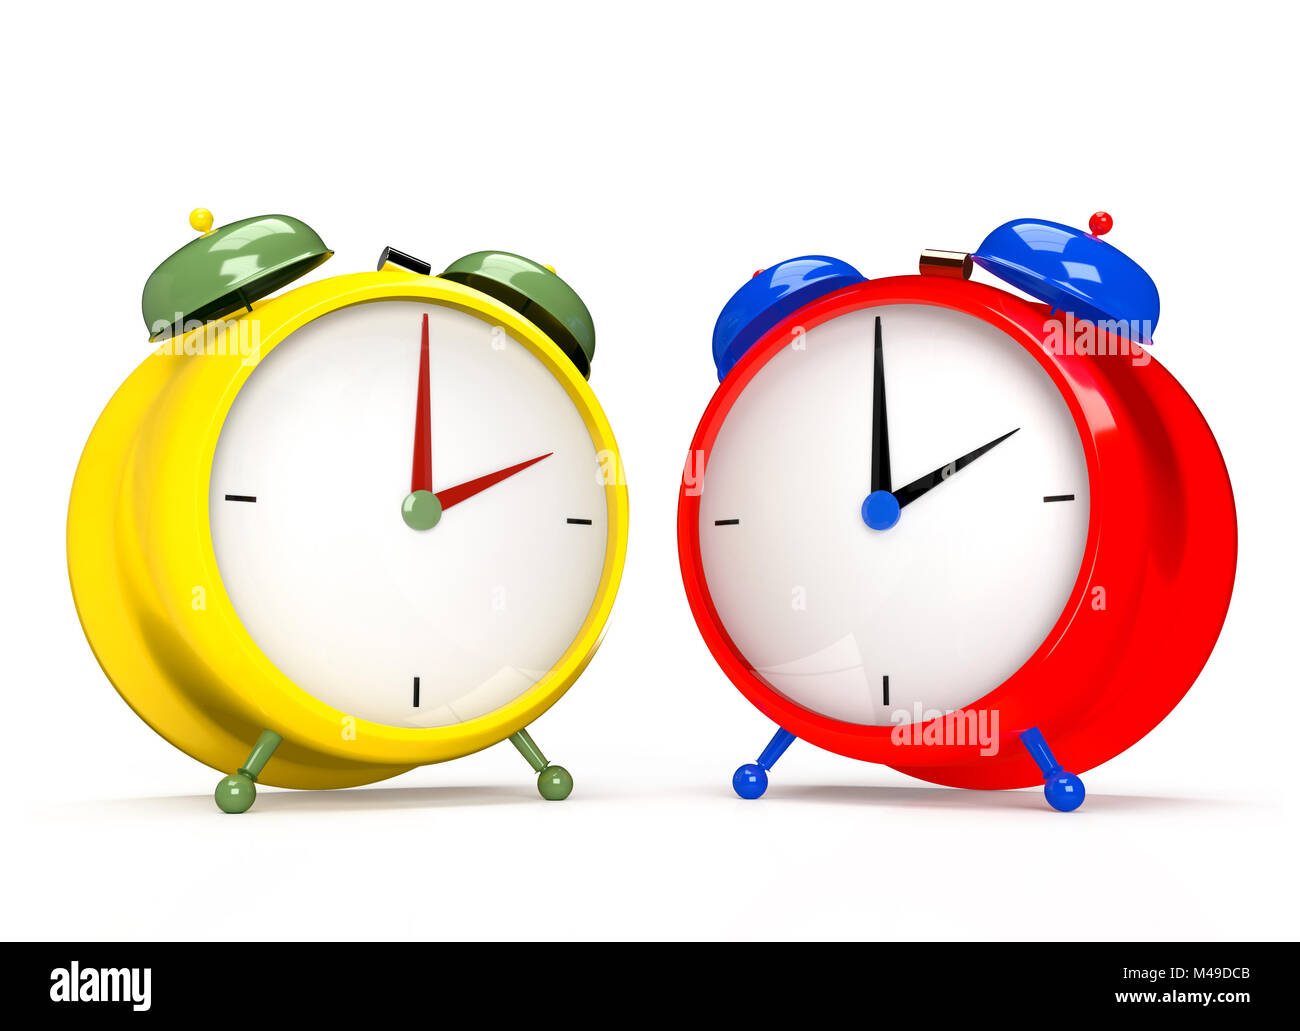 Analogue Clocks Stock Photos Amp Analogue Clocks Stock